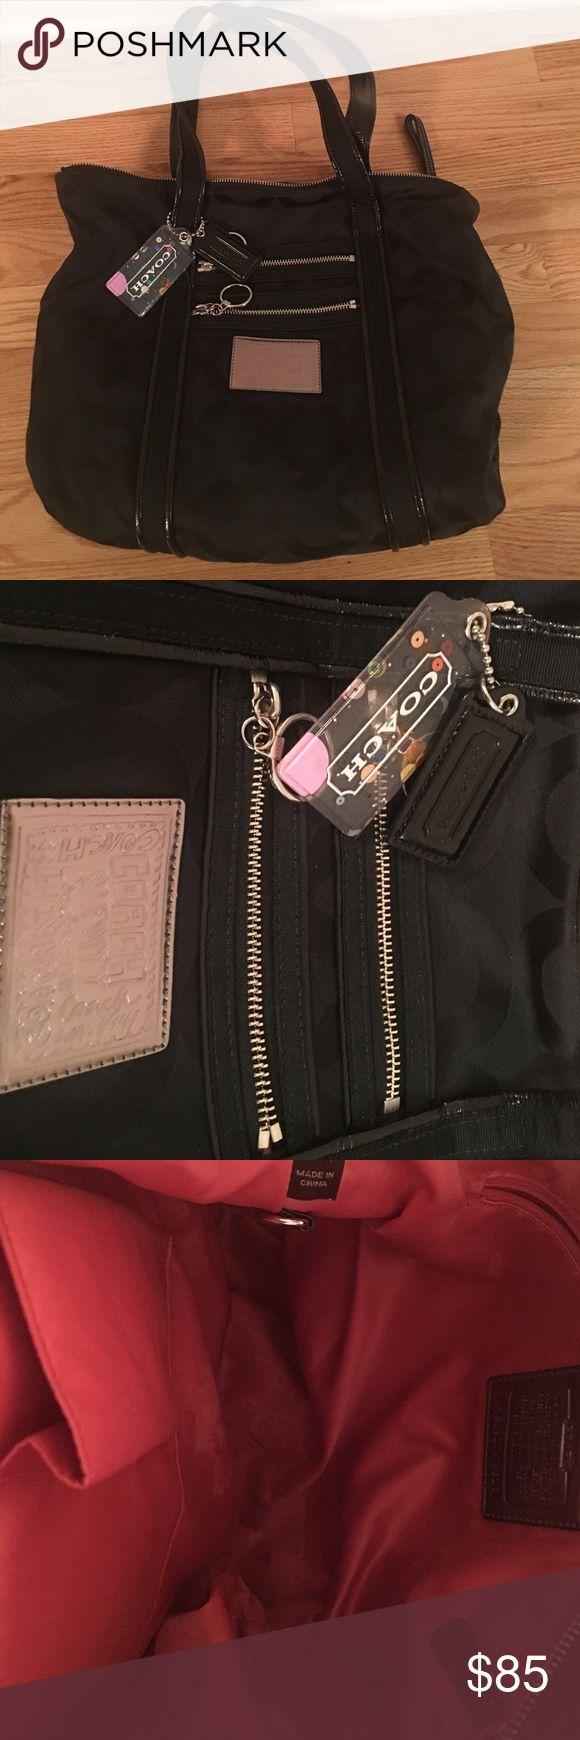 Coach Poppy Bag Coach Poppy Bag in black. EUC Coach Bags Shoulder Bags